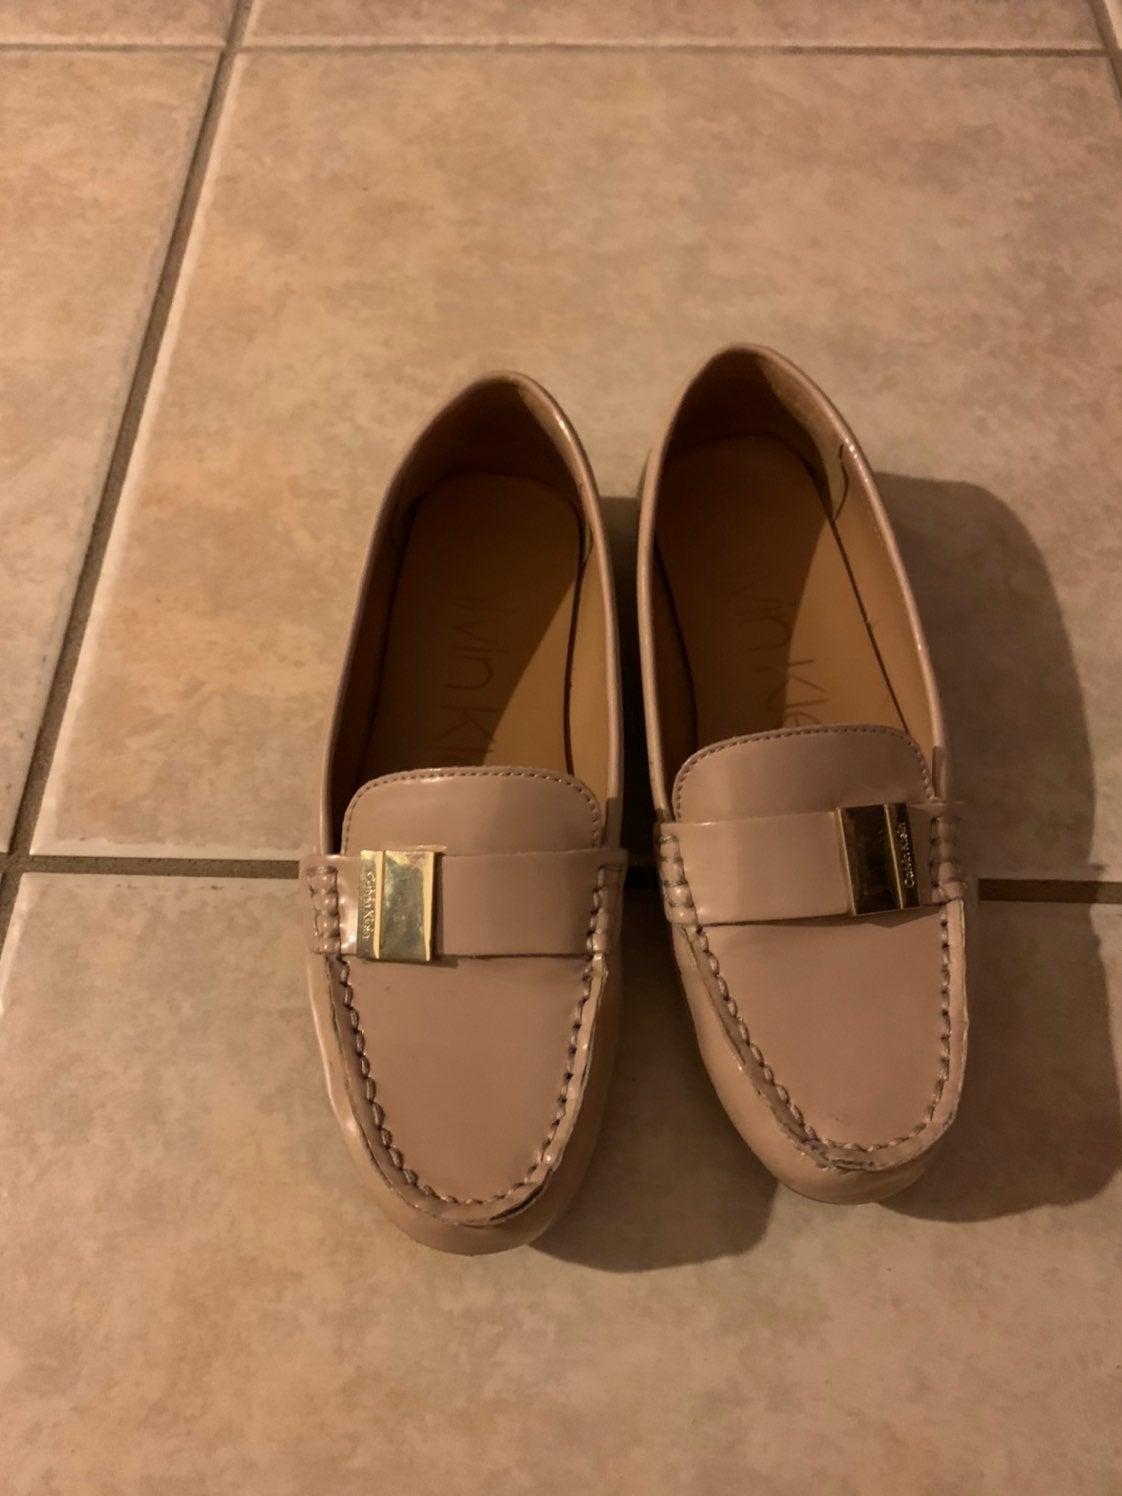 2 Calvin Klein Loafers